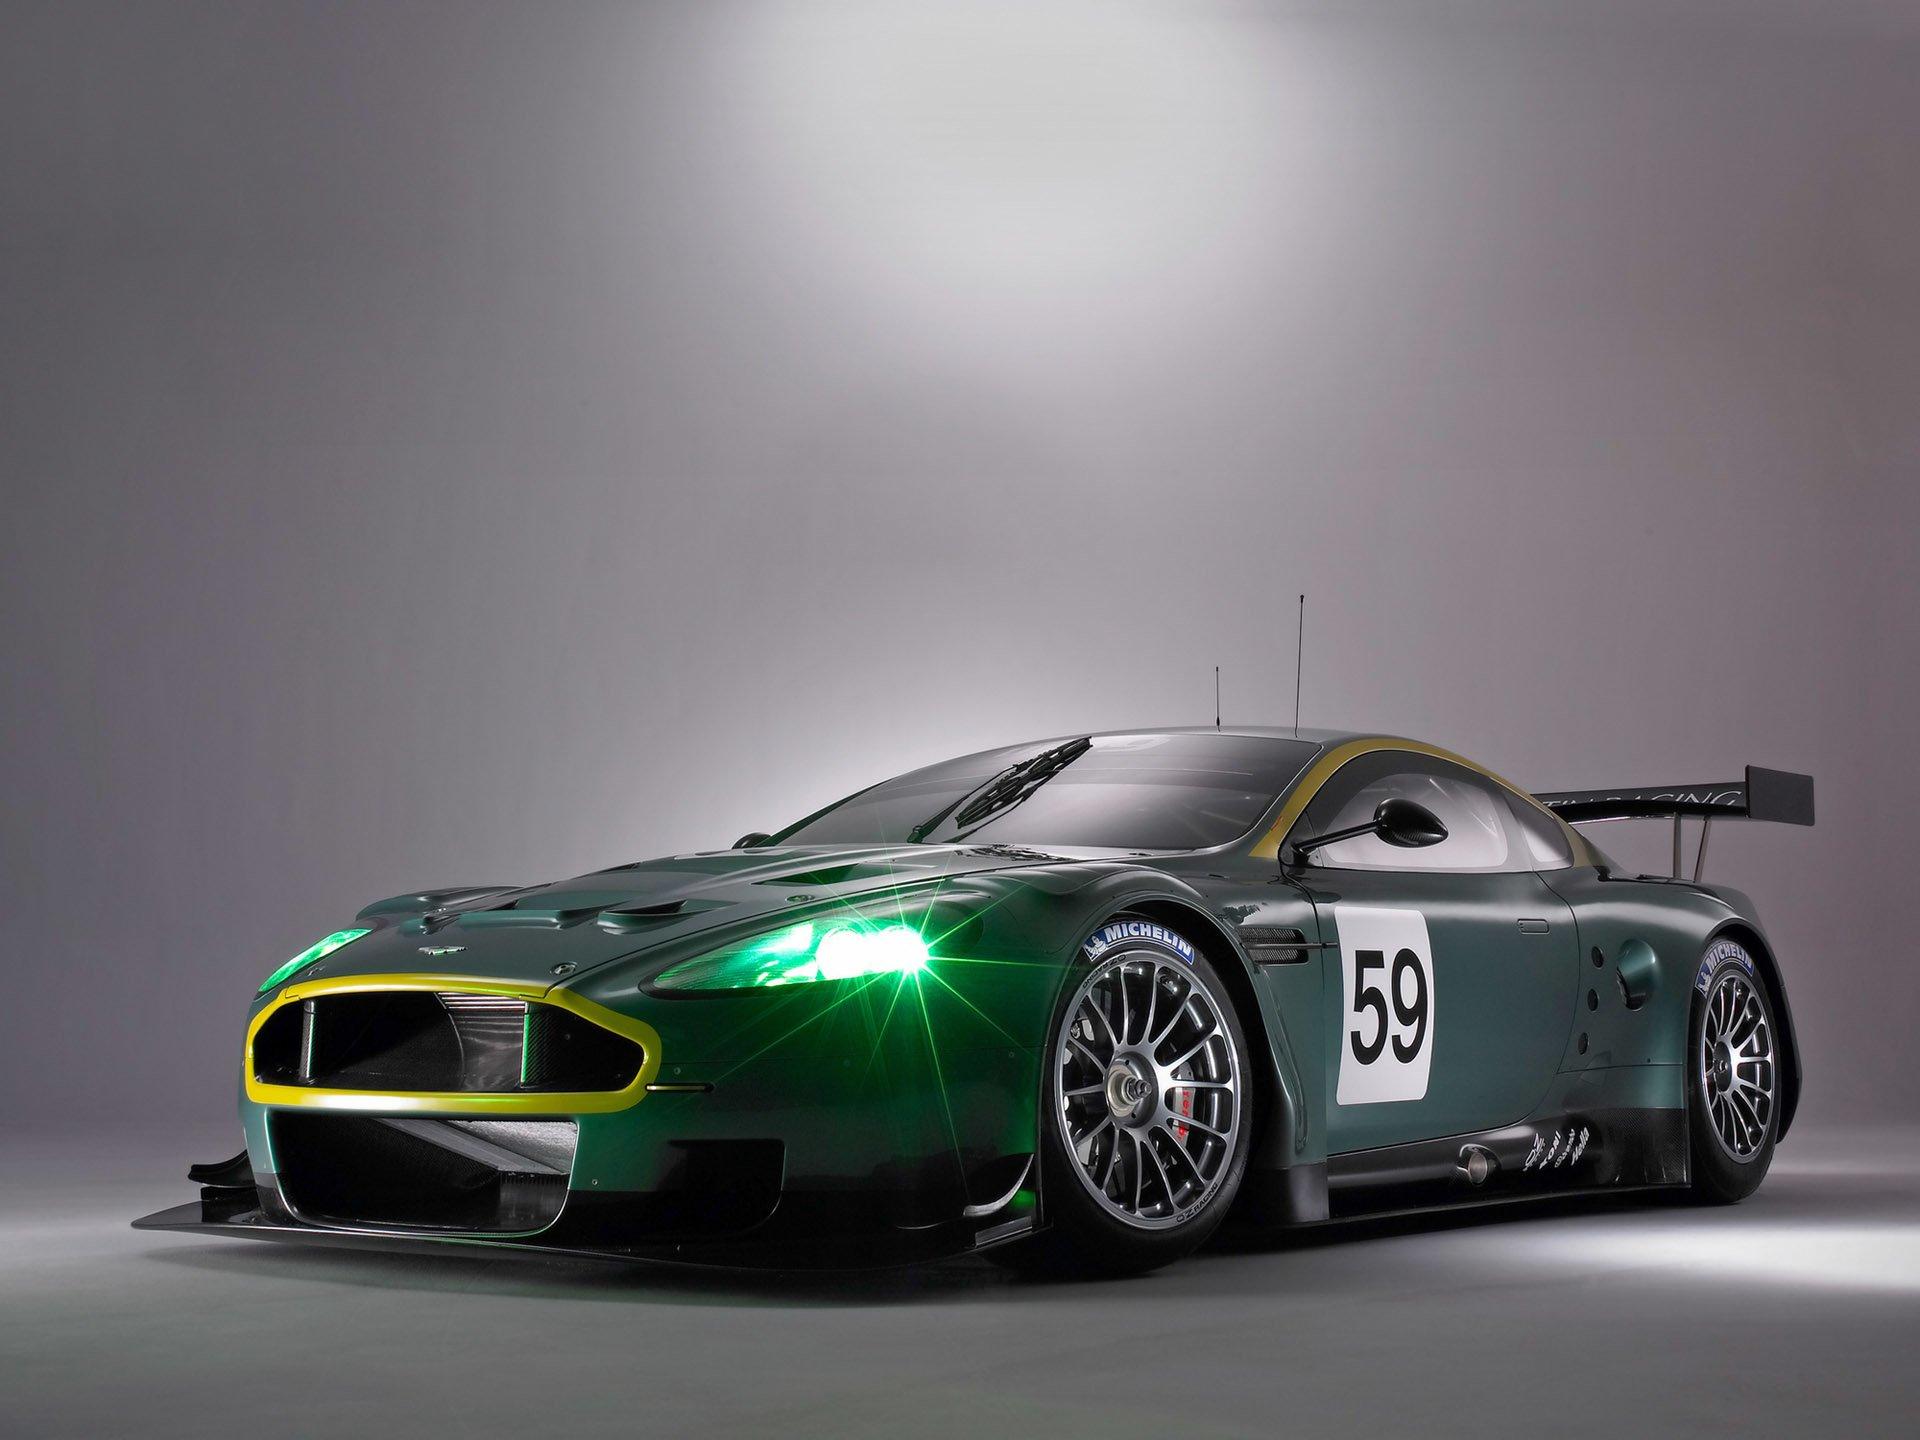 Vehicles - Aston Martin DBR9  Sport Grey Car Green Aston Martin Wallpaper